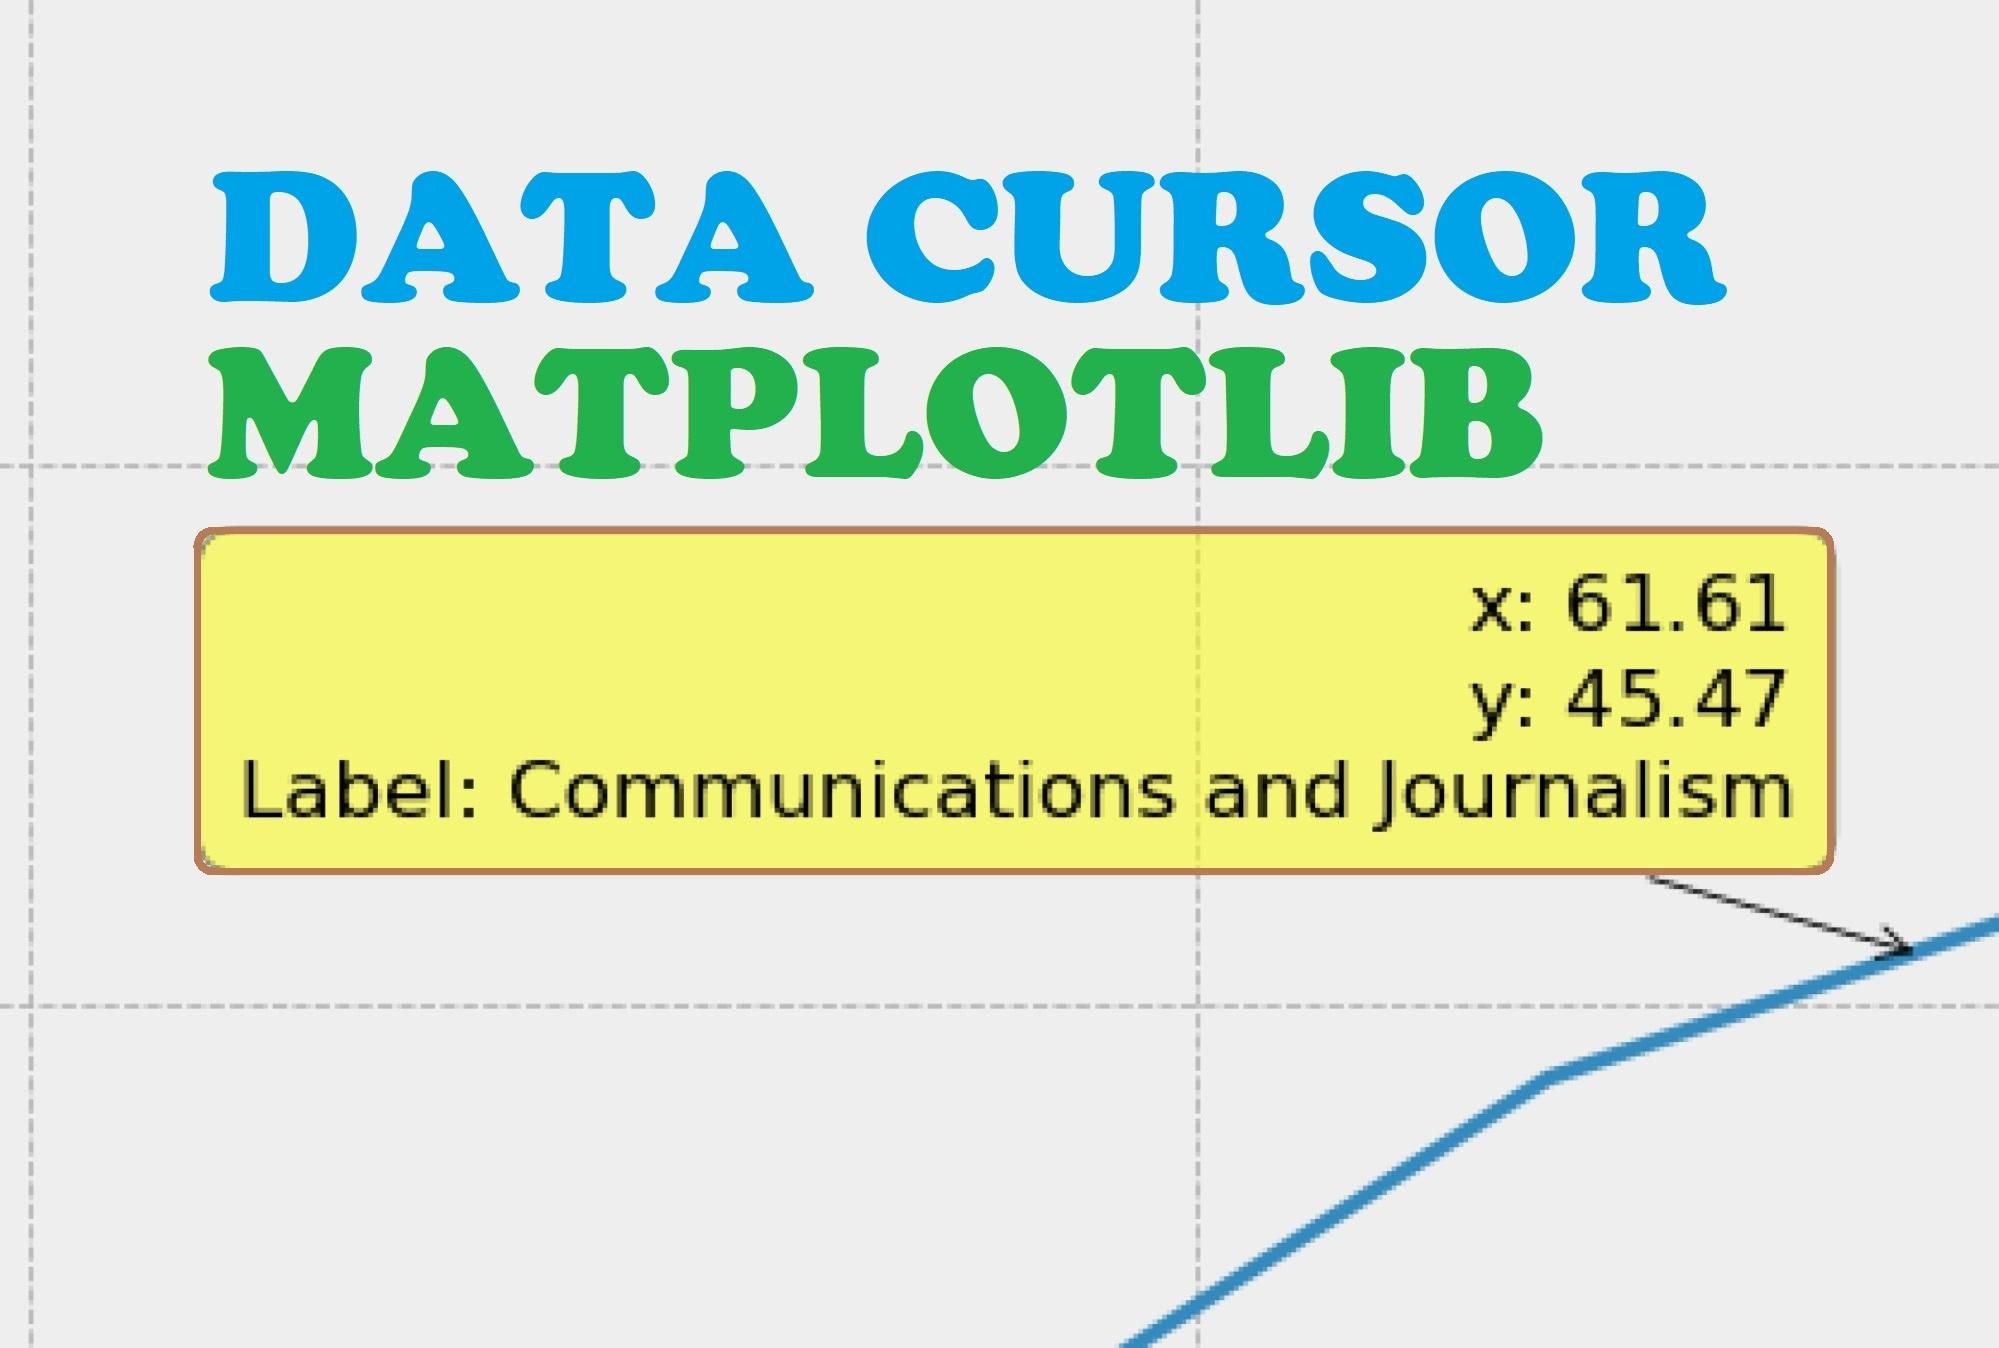 Interactive Matplotlib GUI with data cursors